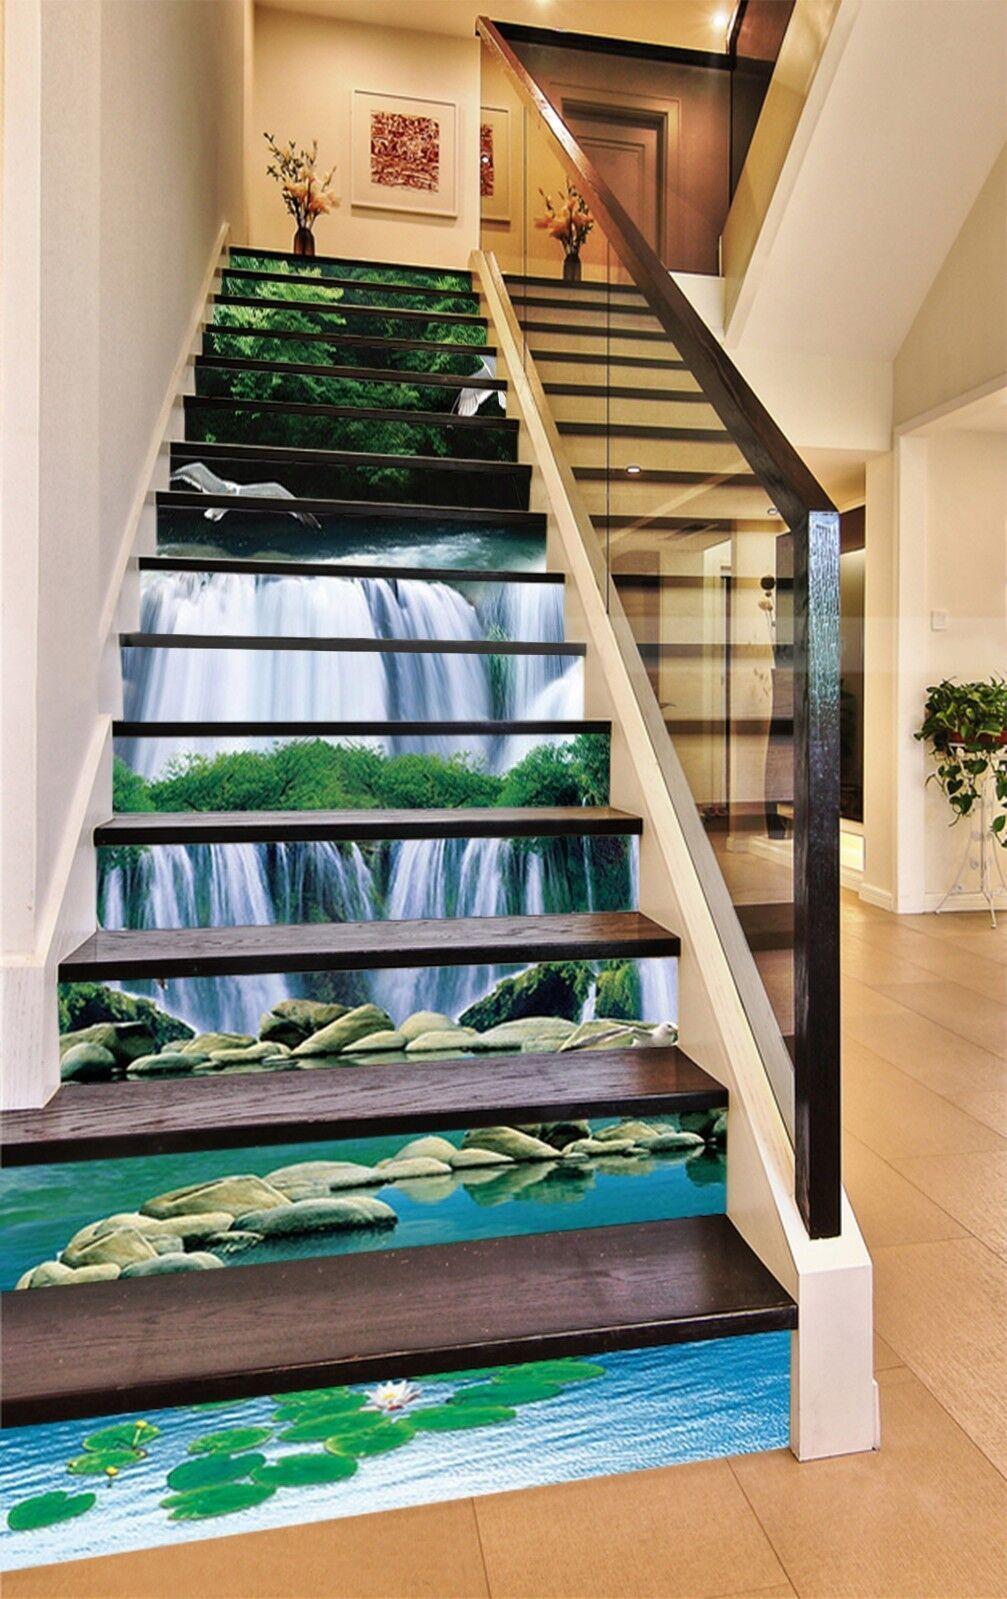 3D Waterfall stone5 Stair Risers Decoration Photo Mural Vinyl Decal Wallpaper UK